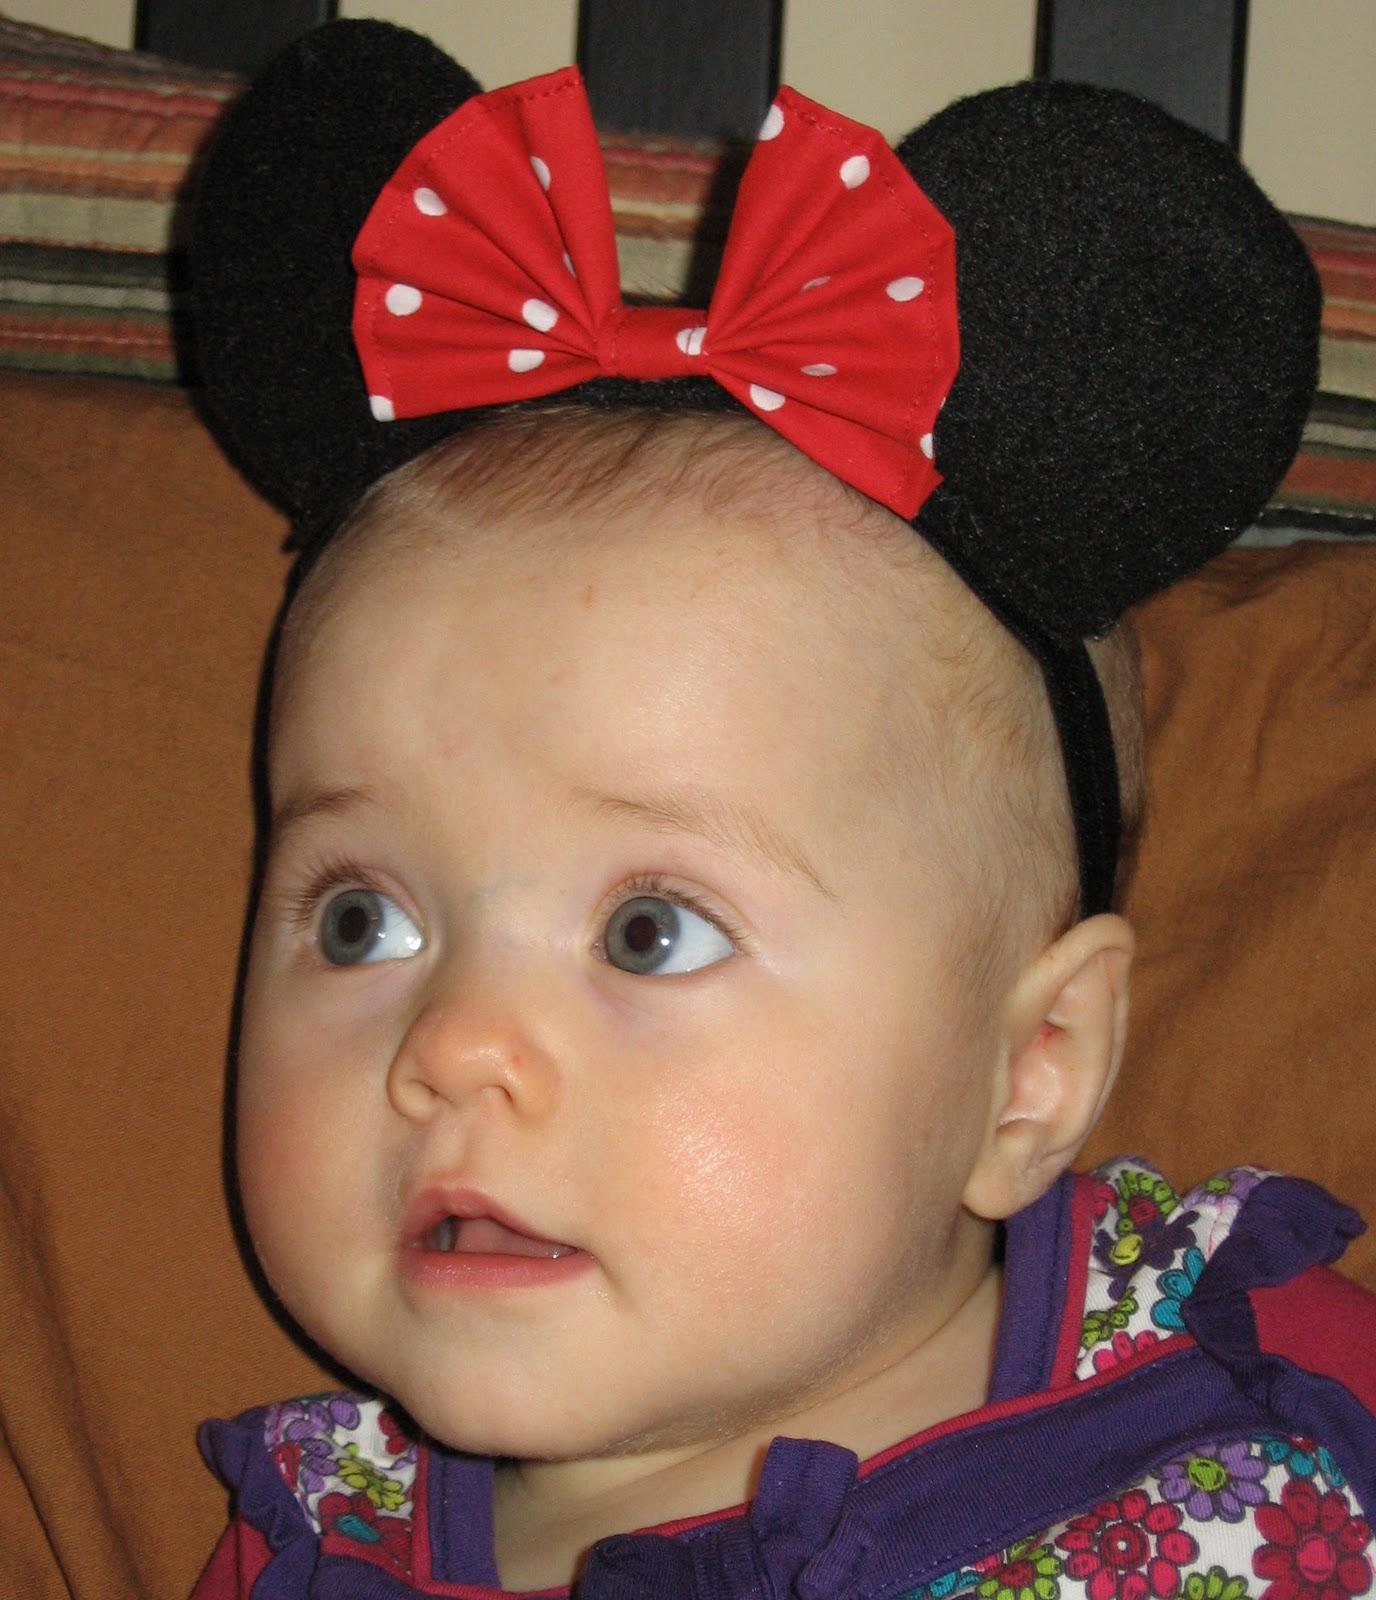 sc 1 st  DIY kinda girl & DIY kinda girl: Minnie Mouse ears for baby tutorial